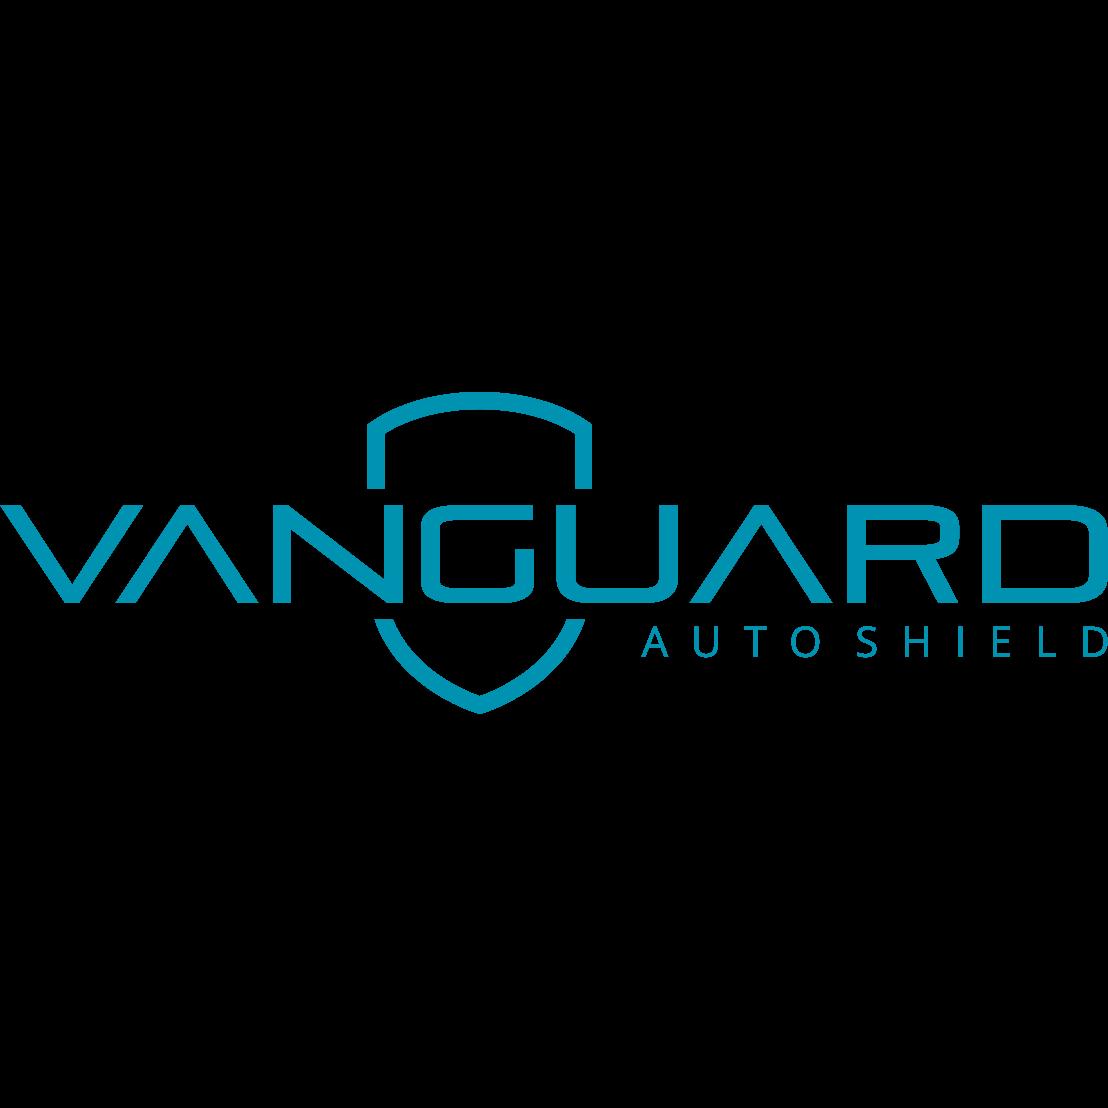 Vanguard Auto Shield, LLC